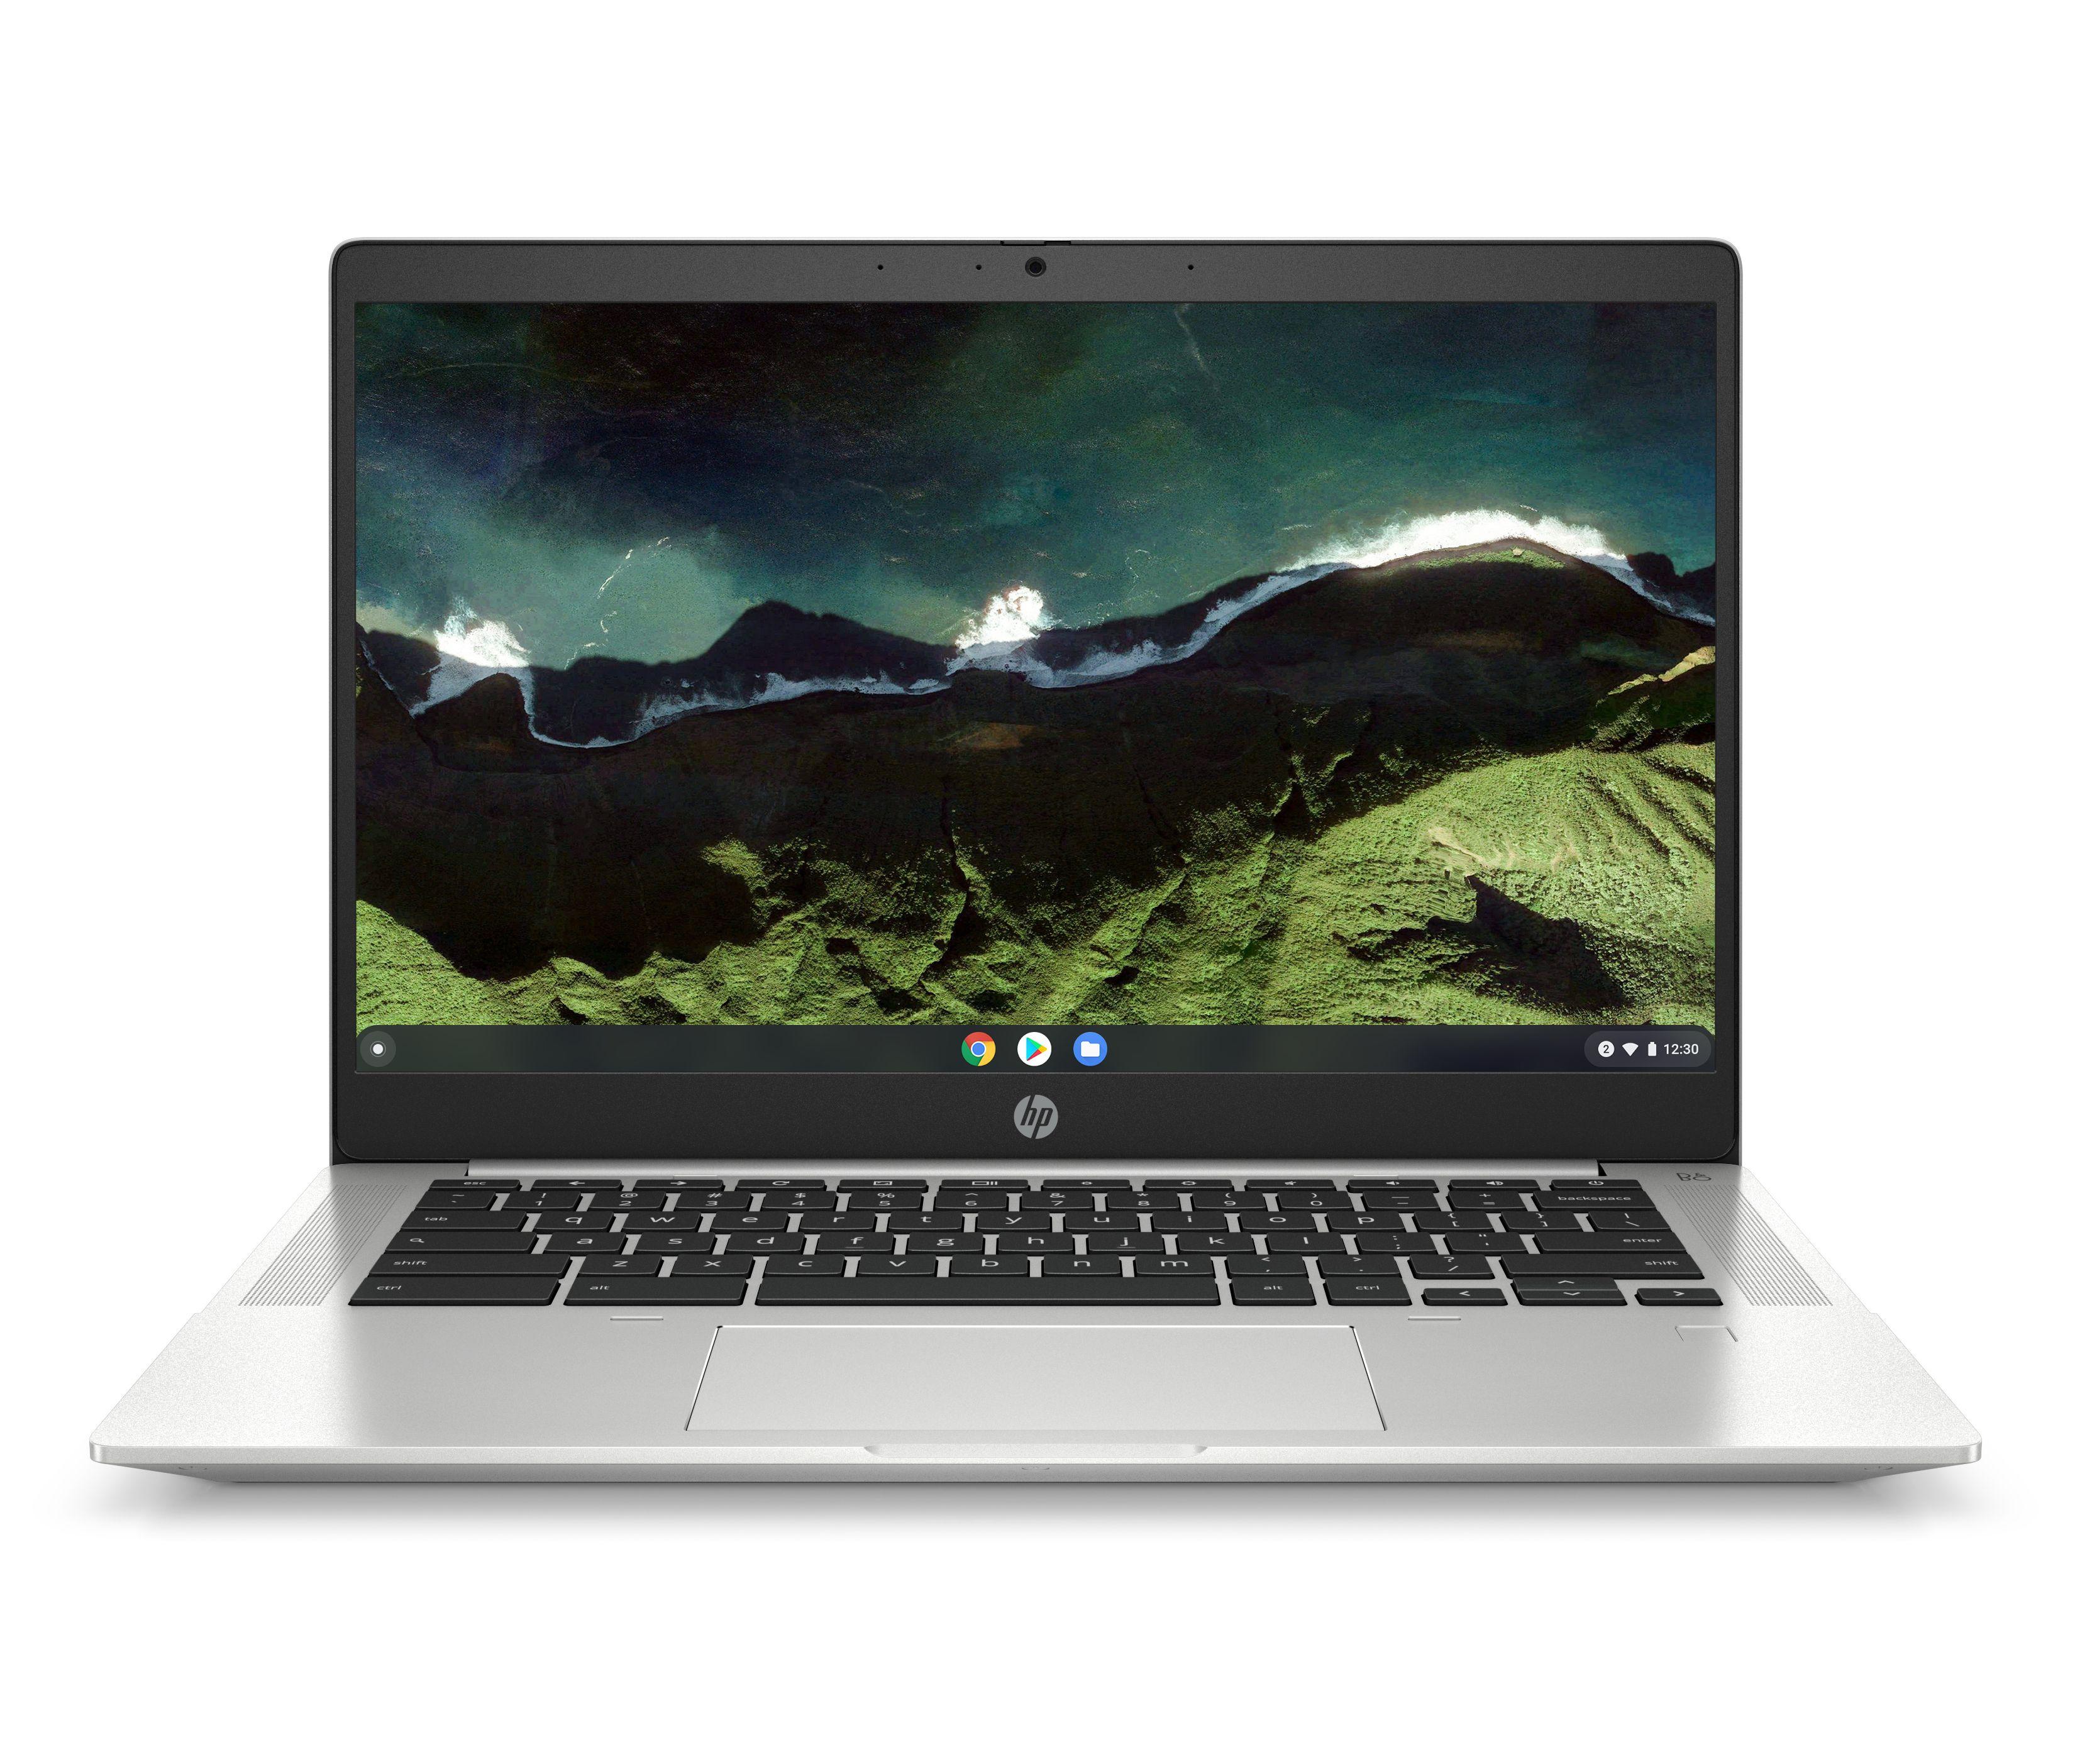 HP Pro c640 Chromebook G2